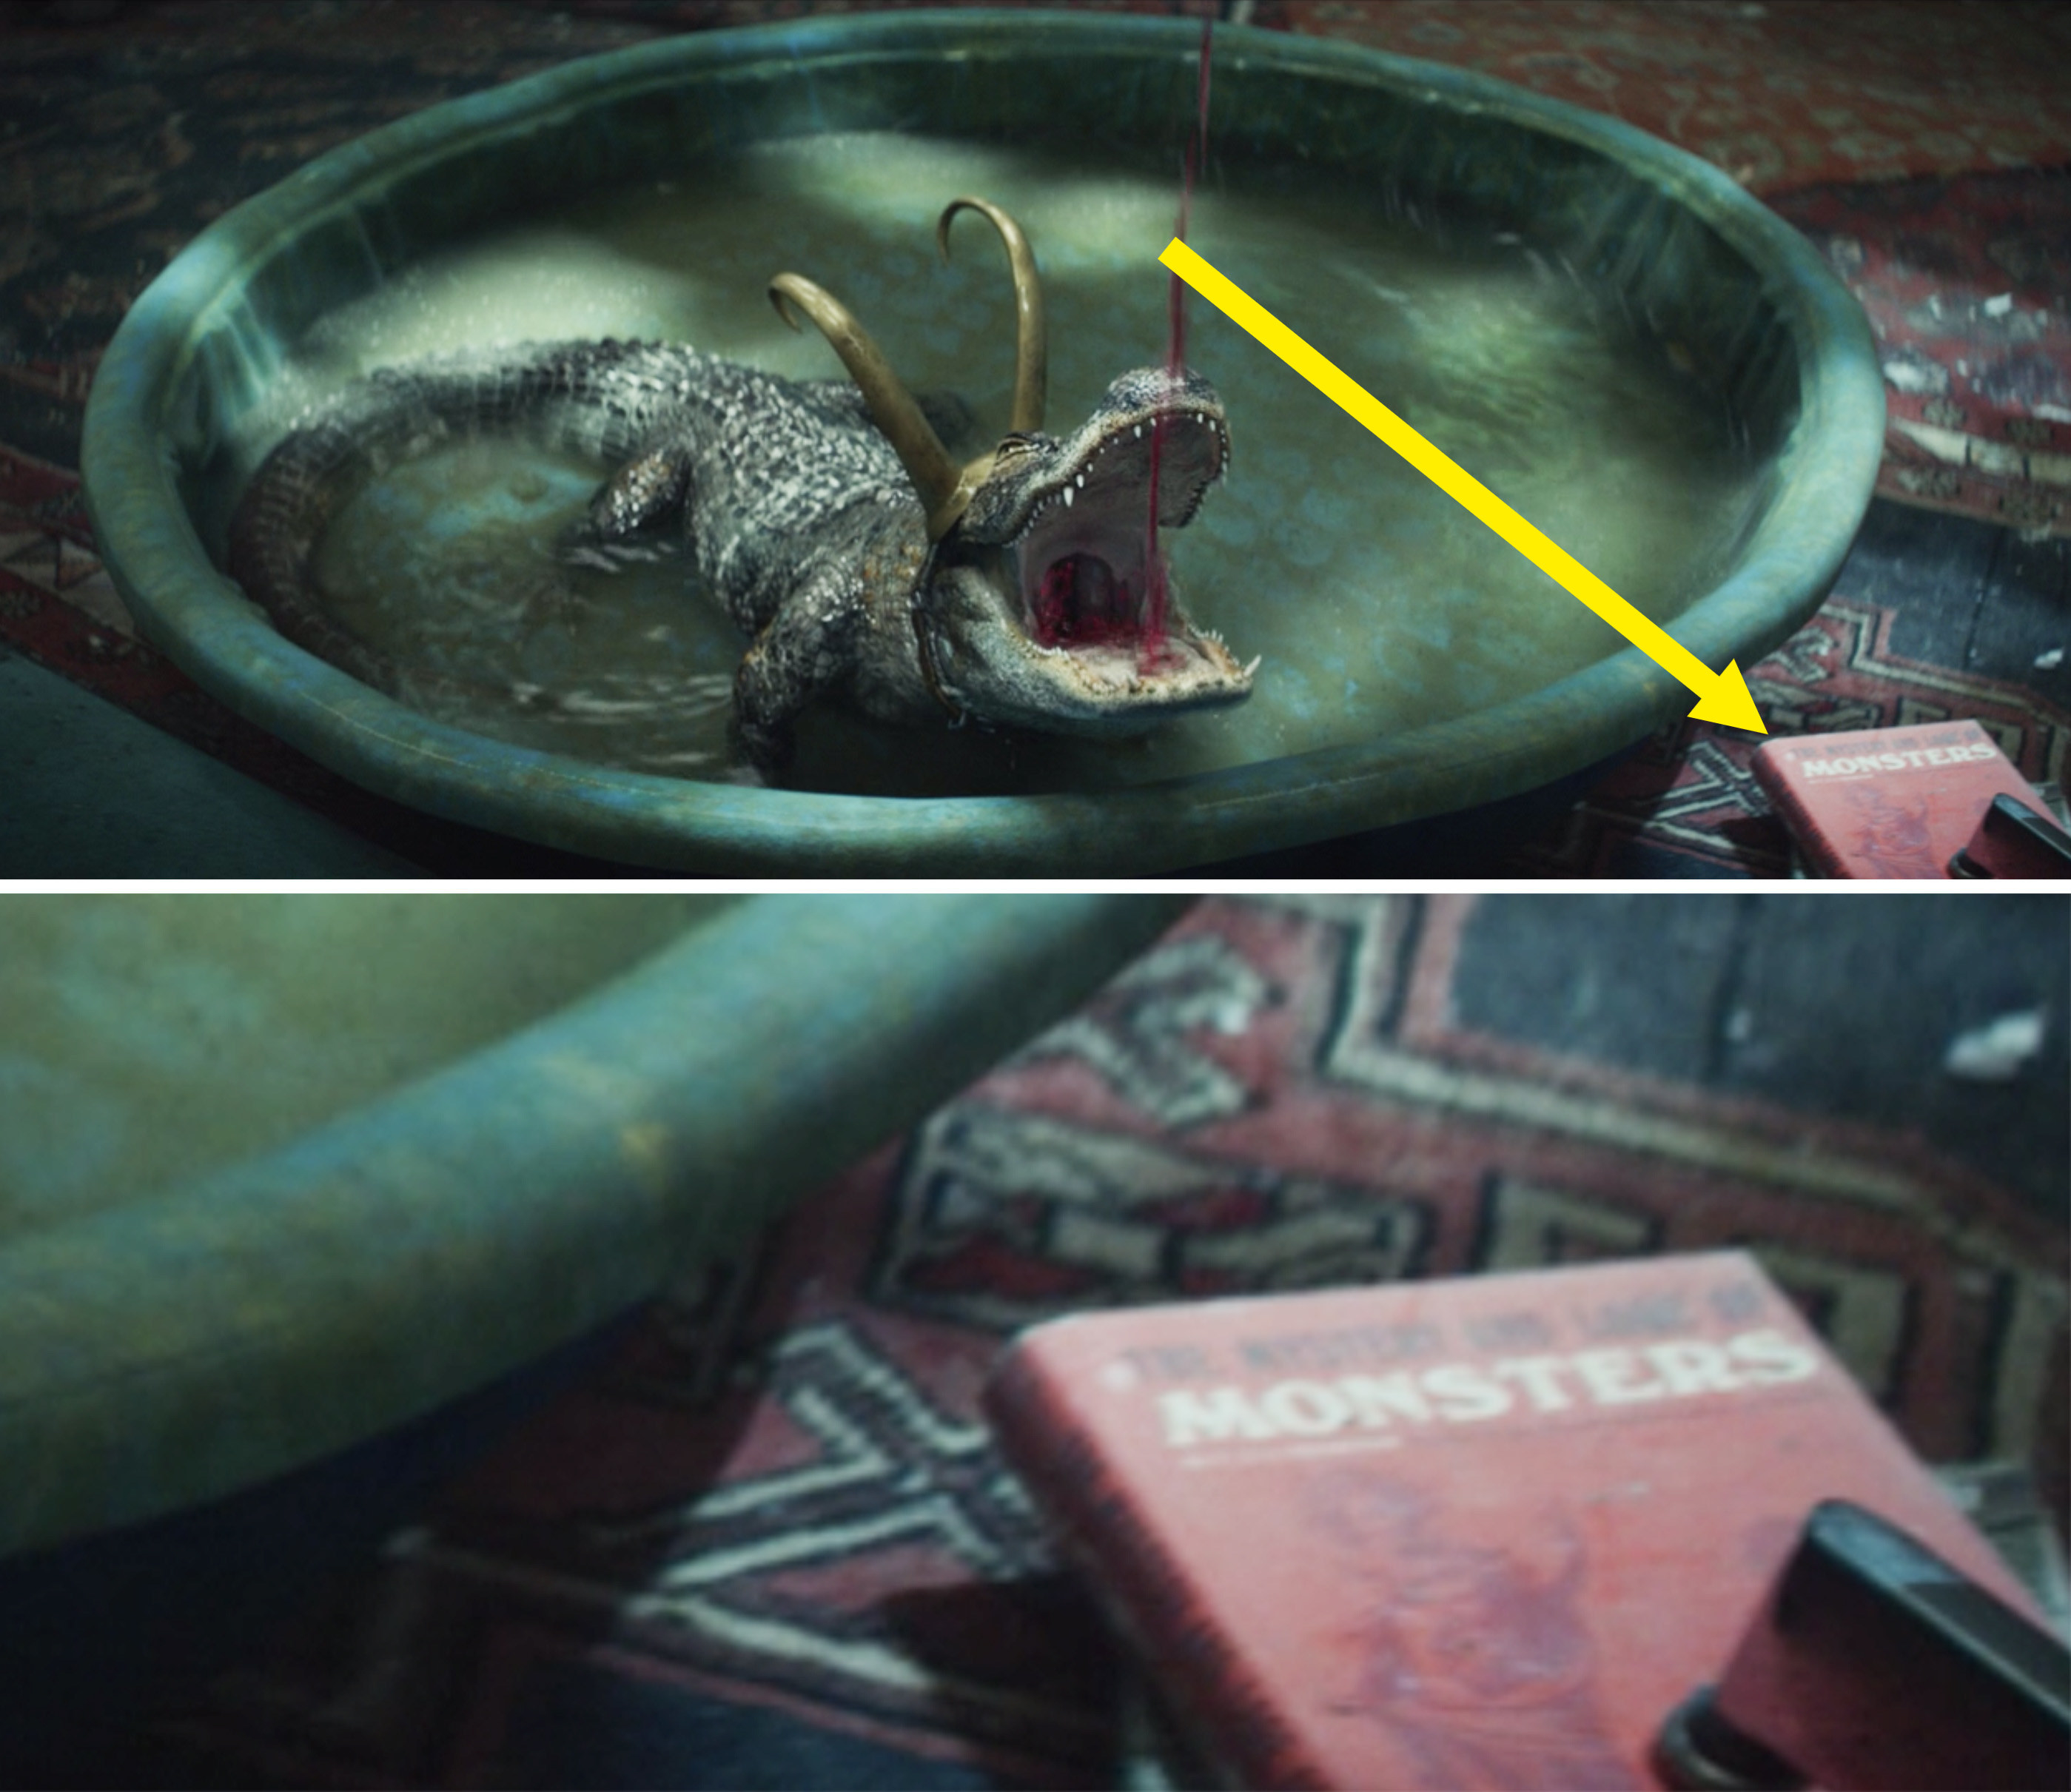 Alligator Loki drinking wine in a kiddie pool next to a book